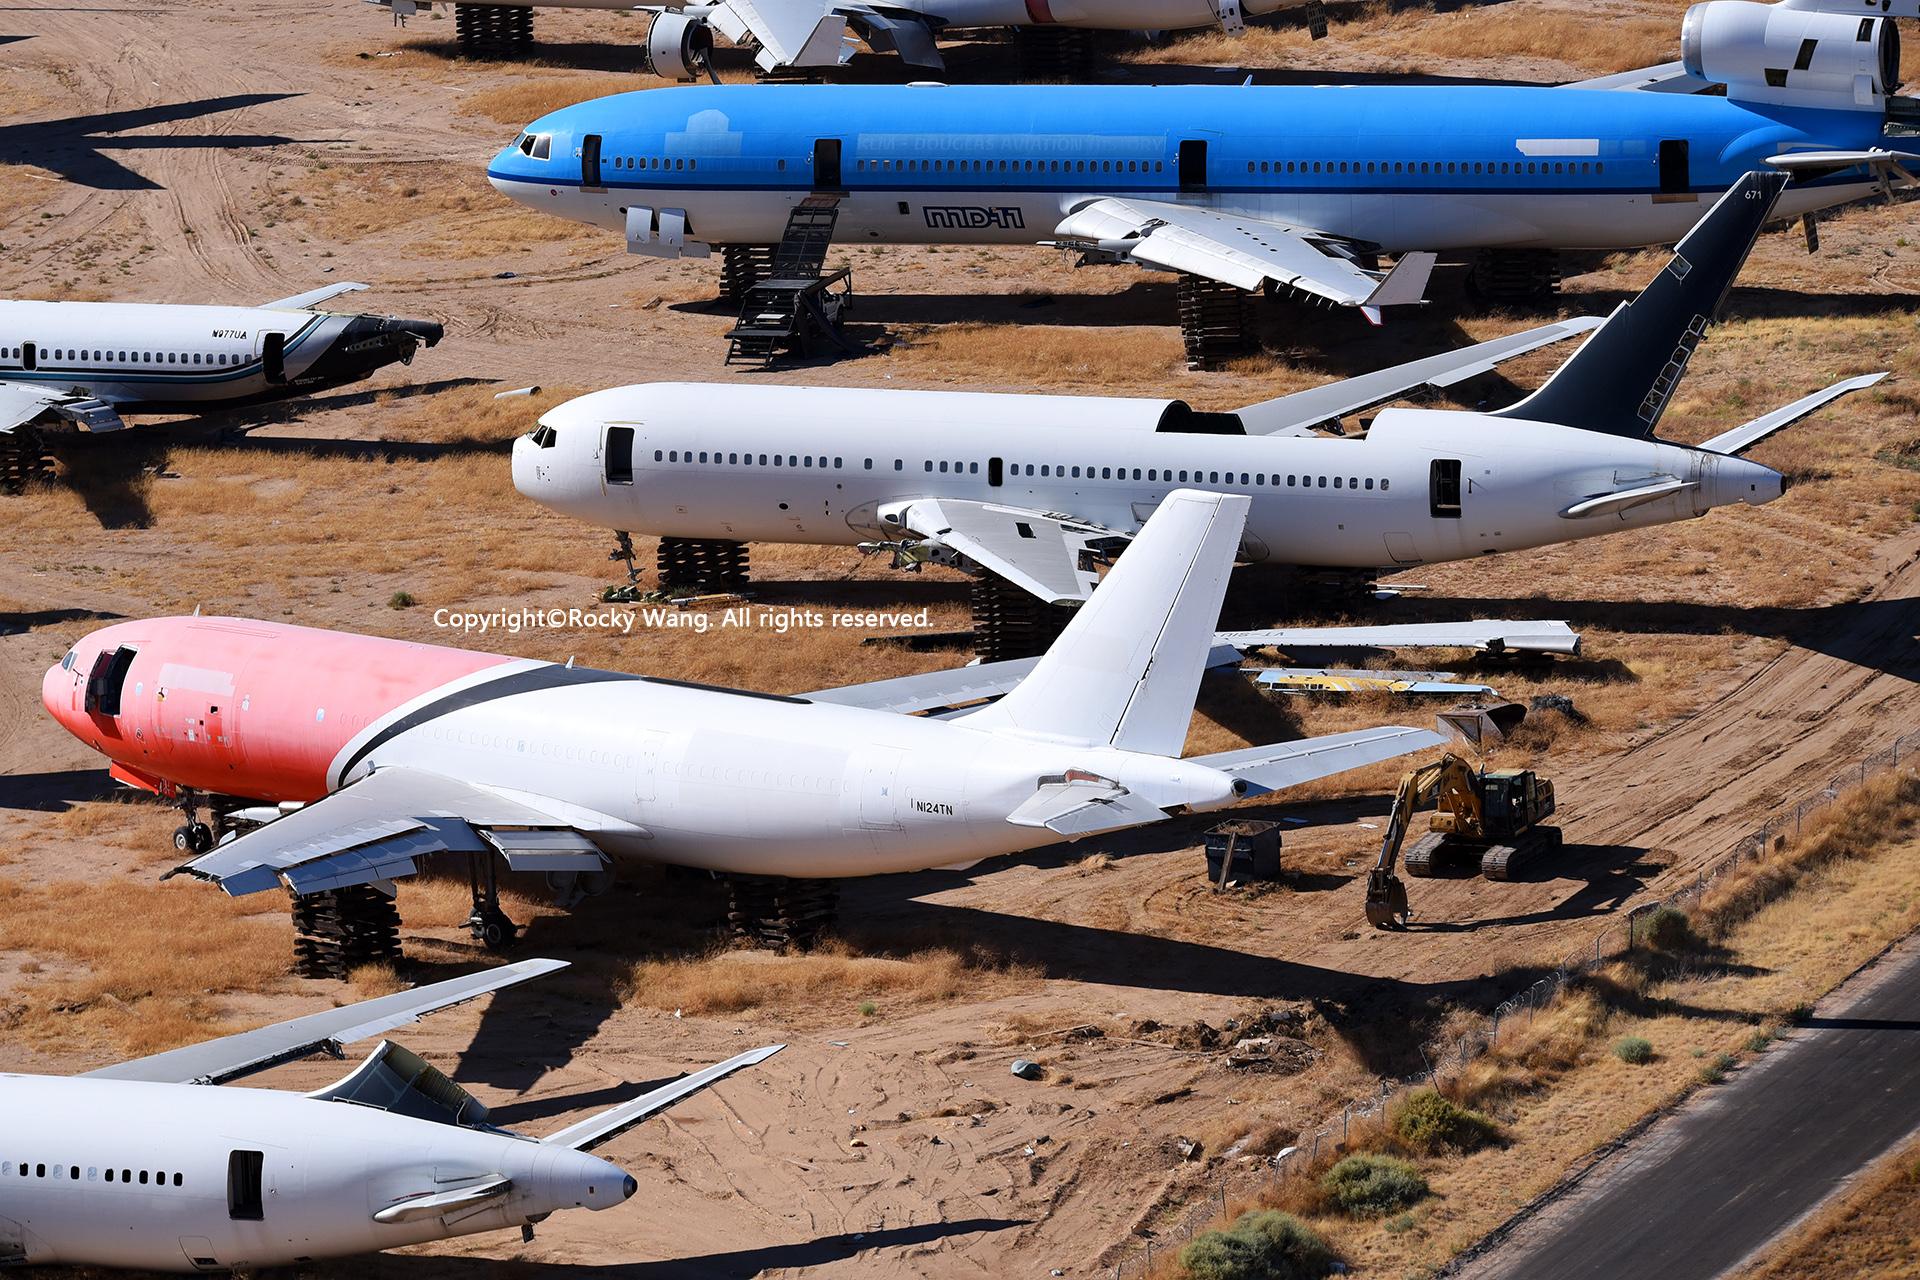 Re:[原创]沙漠29图+彩蛋 AIRBUS A300B4-103(F) N124TN Mojave Airport